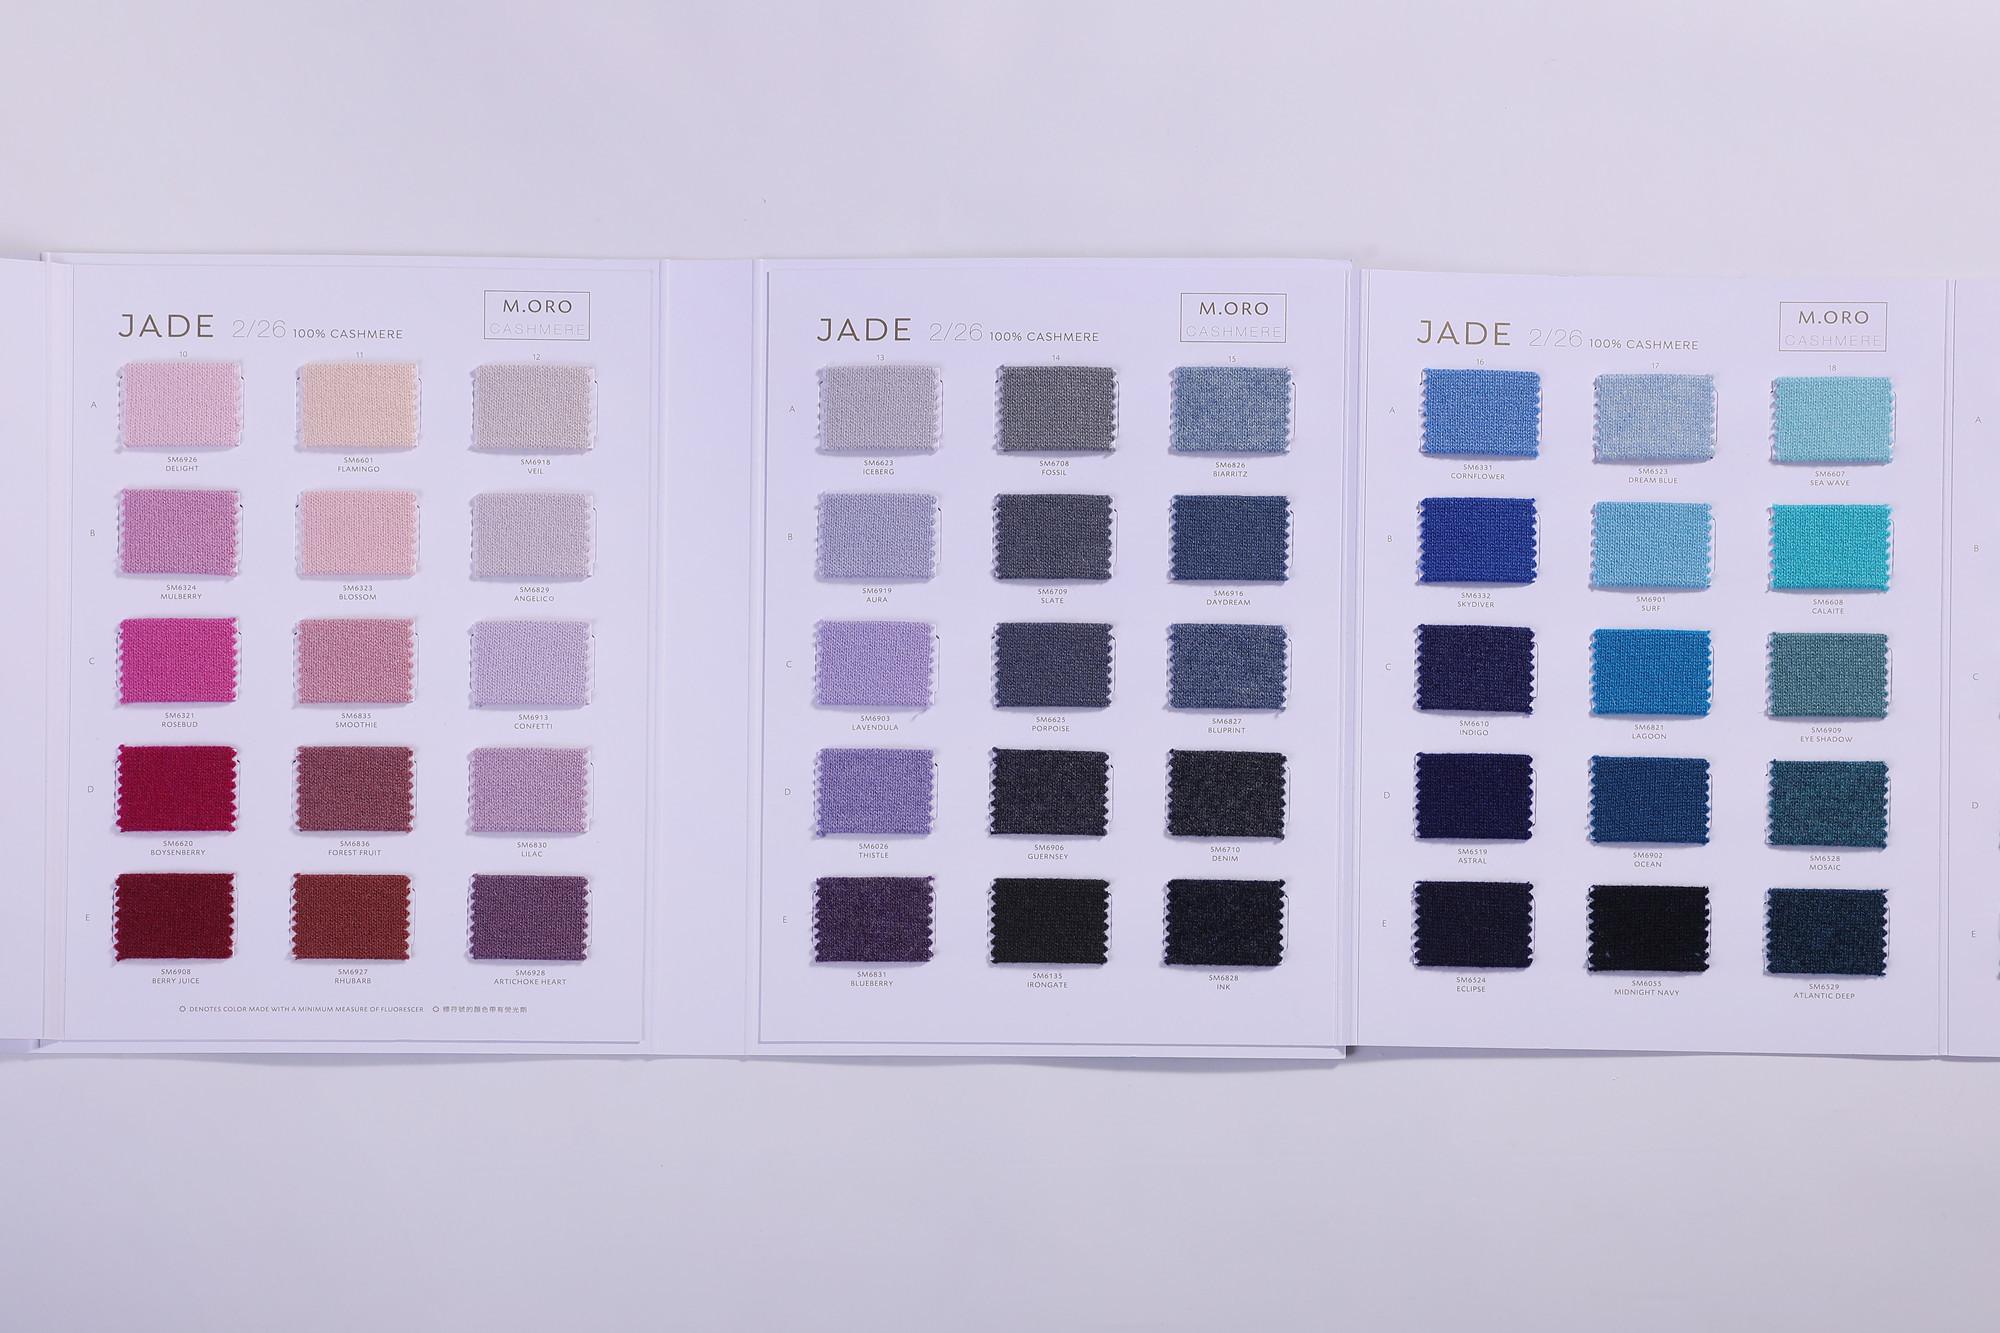 tarjetas de color de cachemir